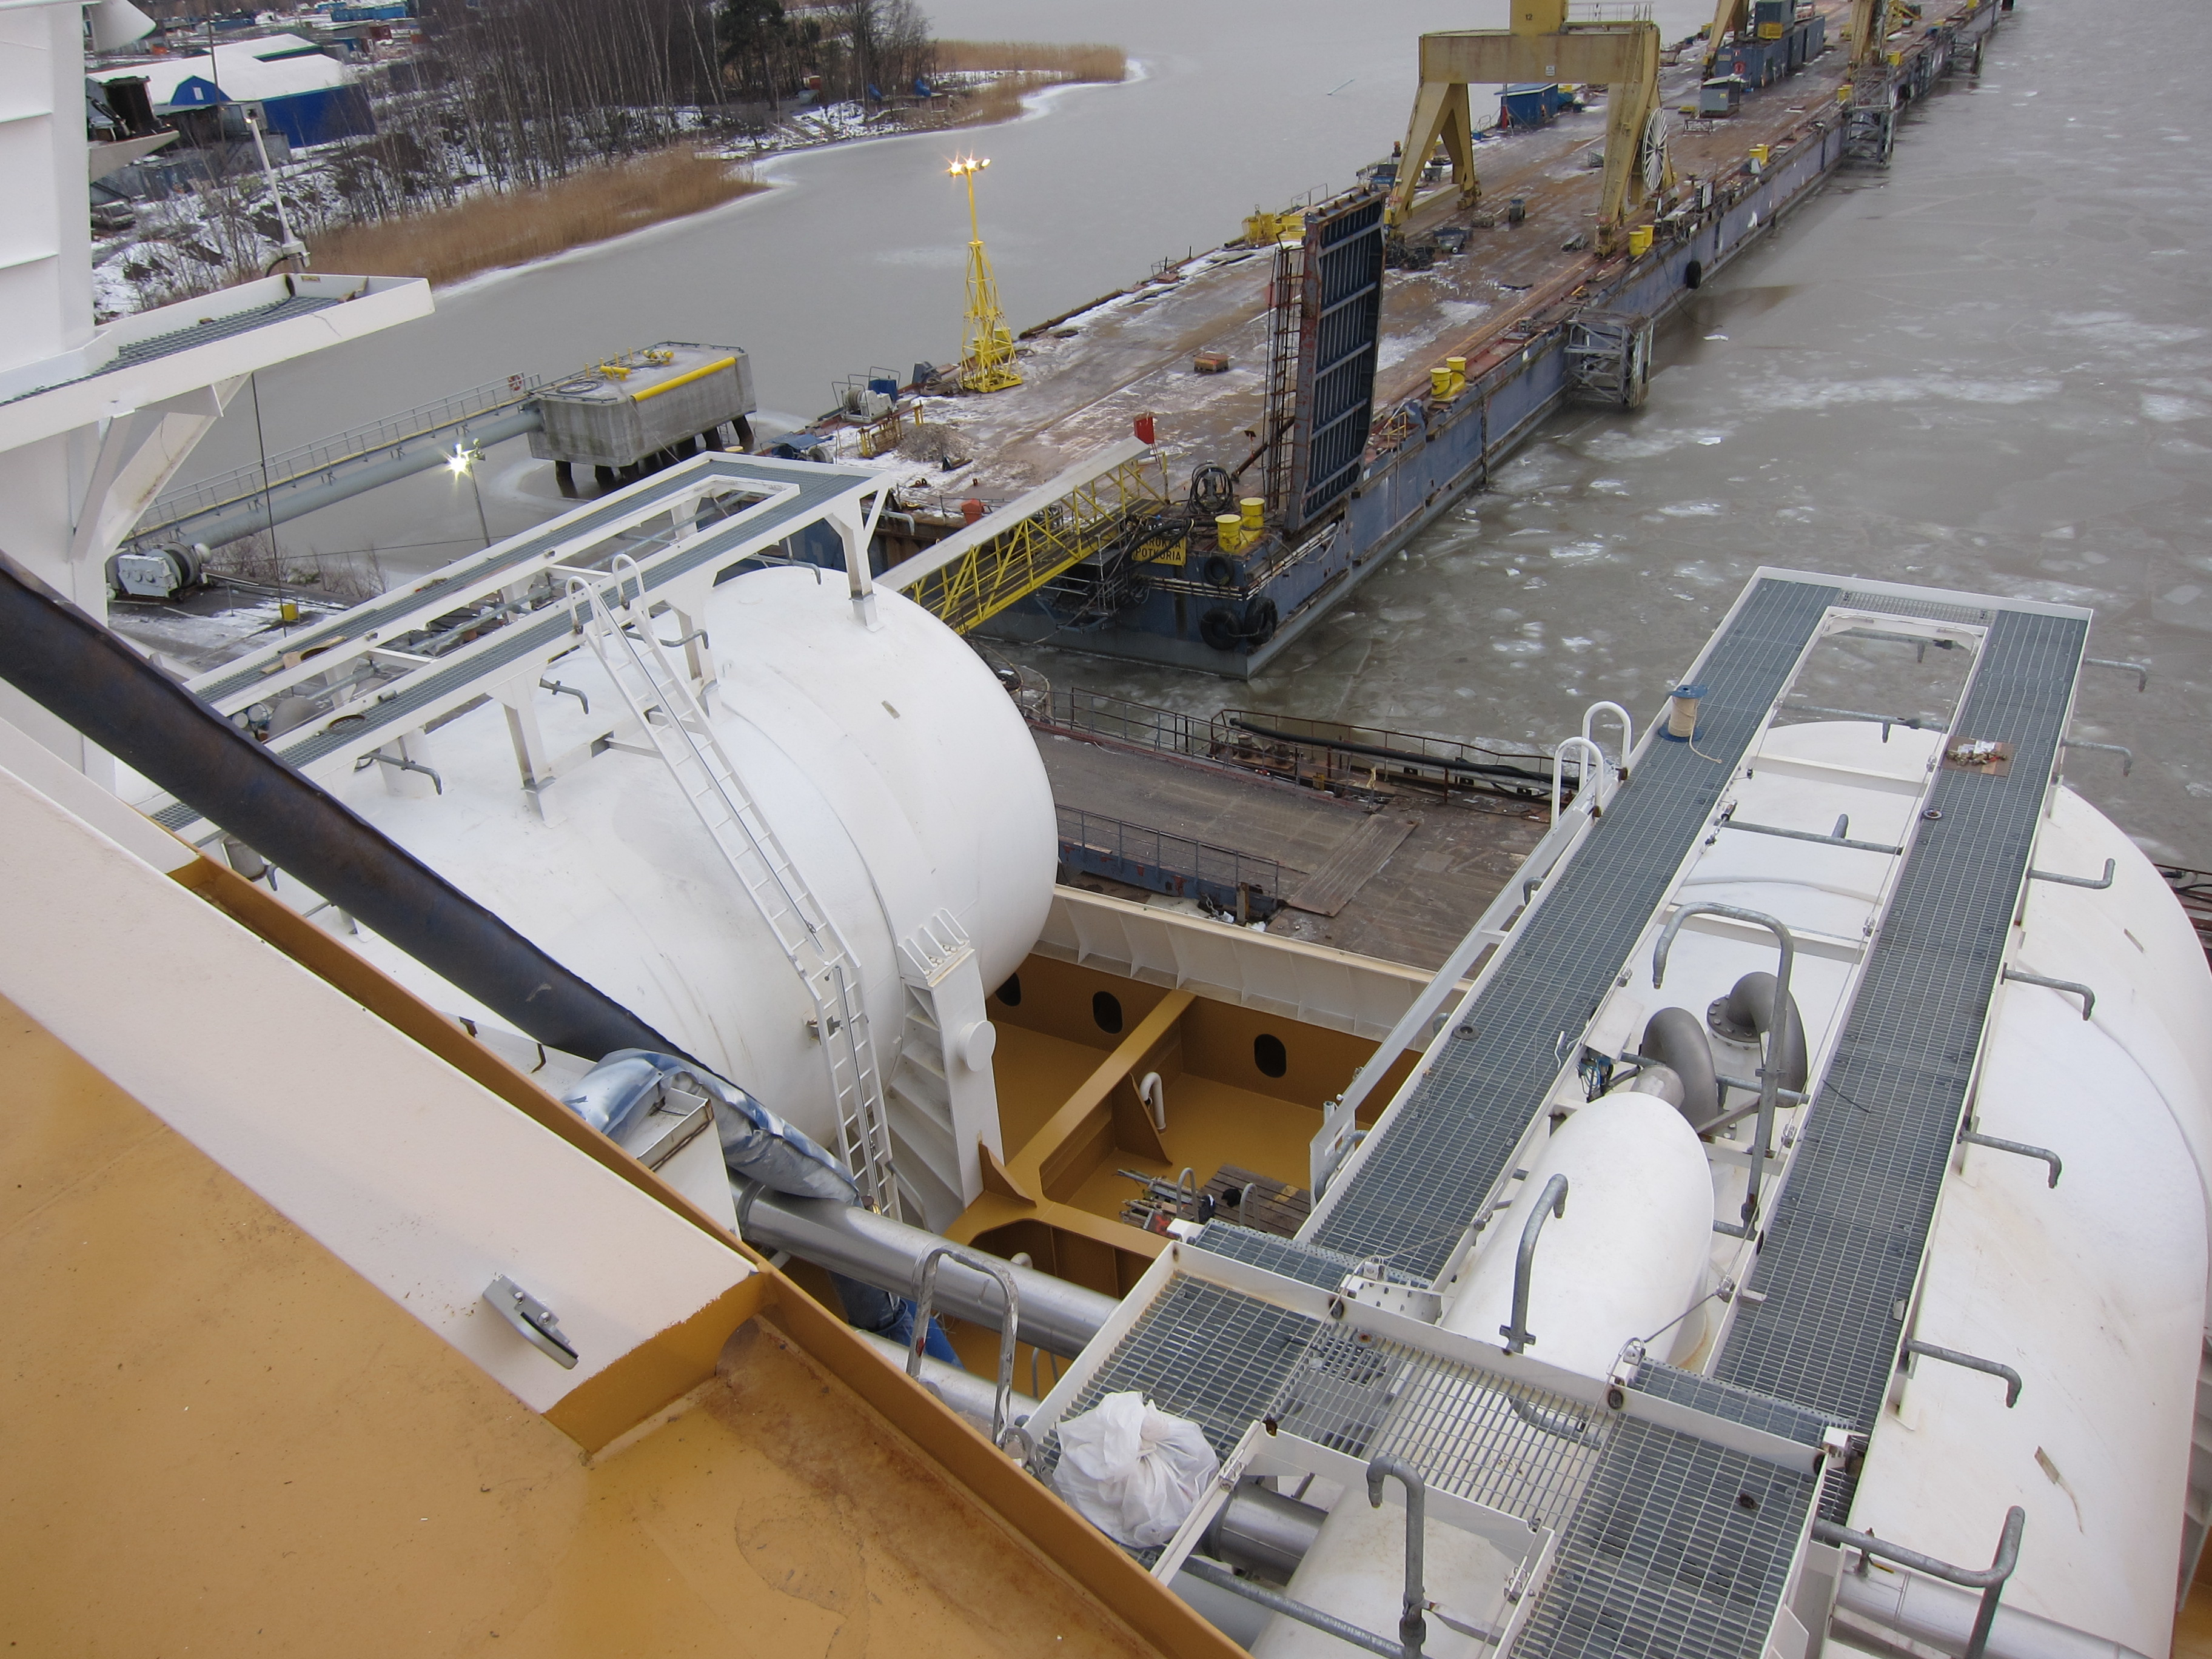 Description LNG-säiliöt, MS Viking Grace, Pernon telakka, Turku, 5.1